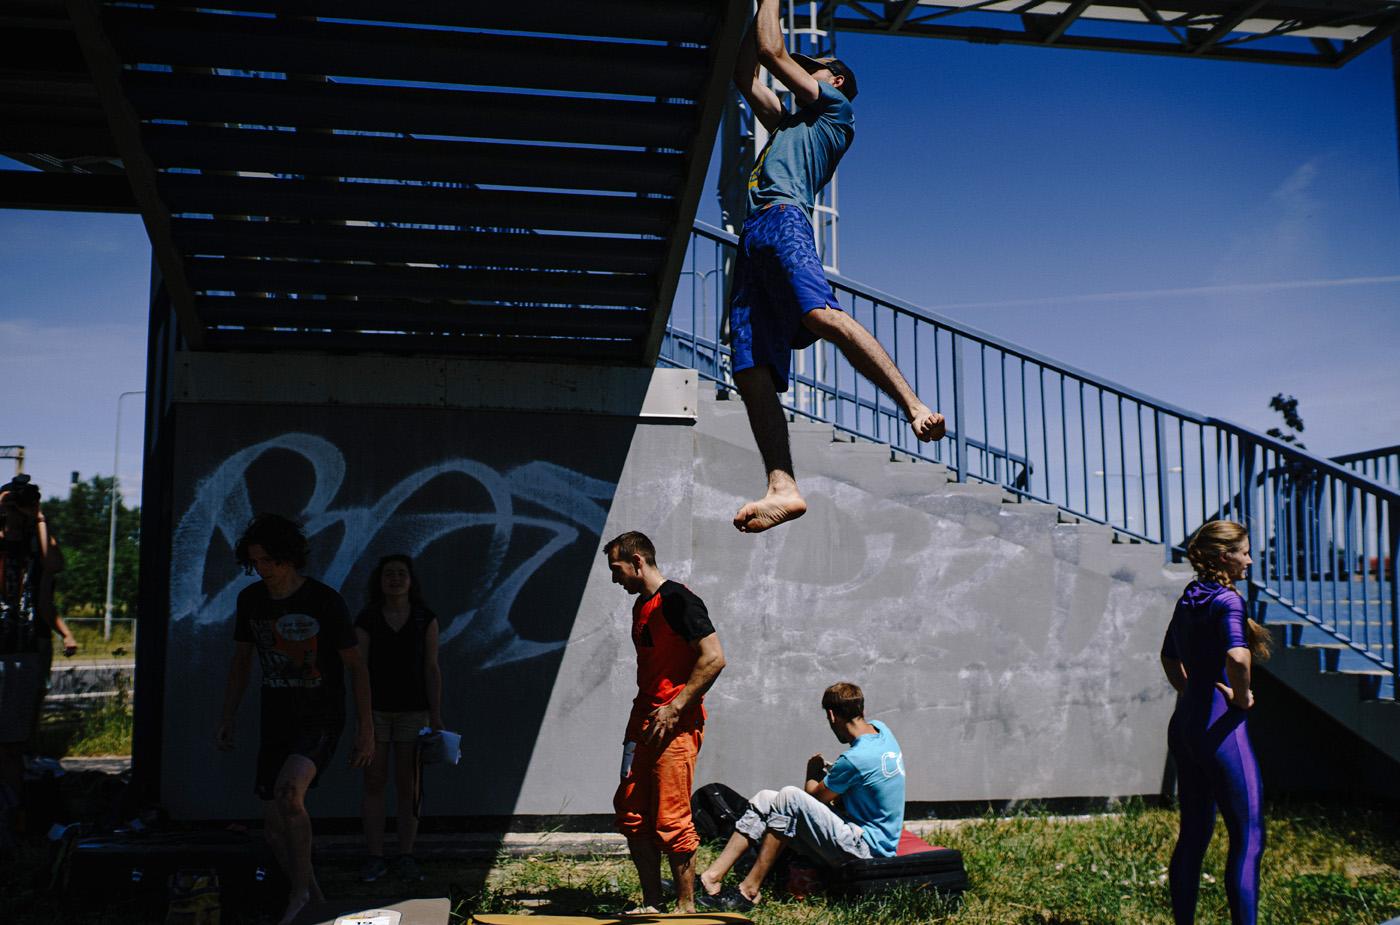 KSF # 5 Urban climbing 15